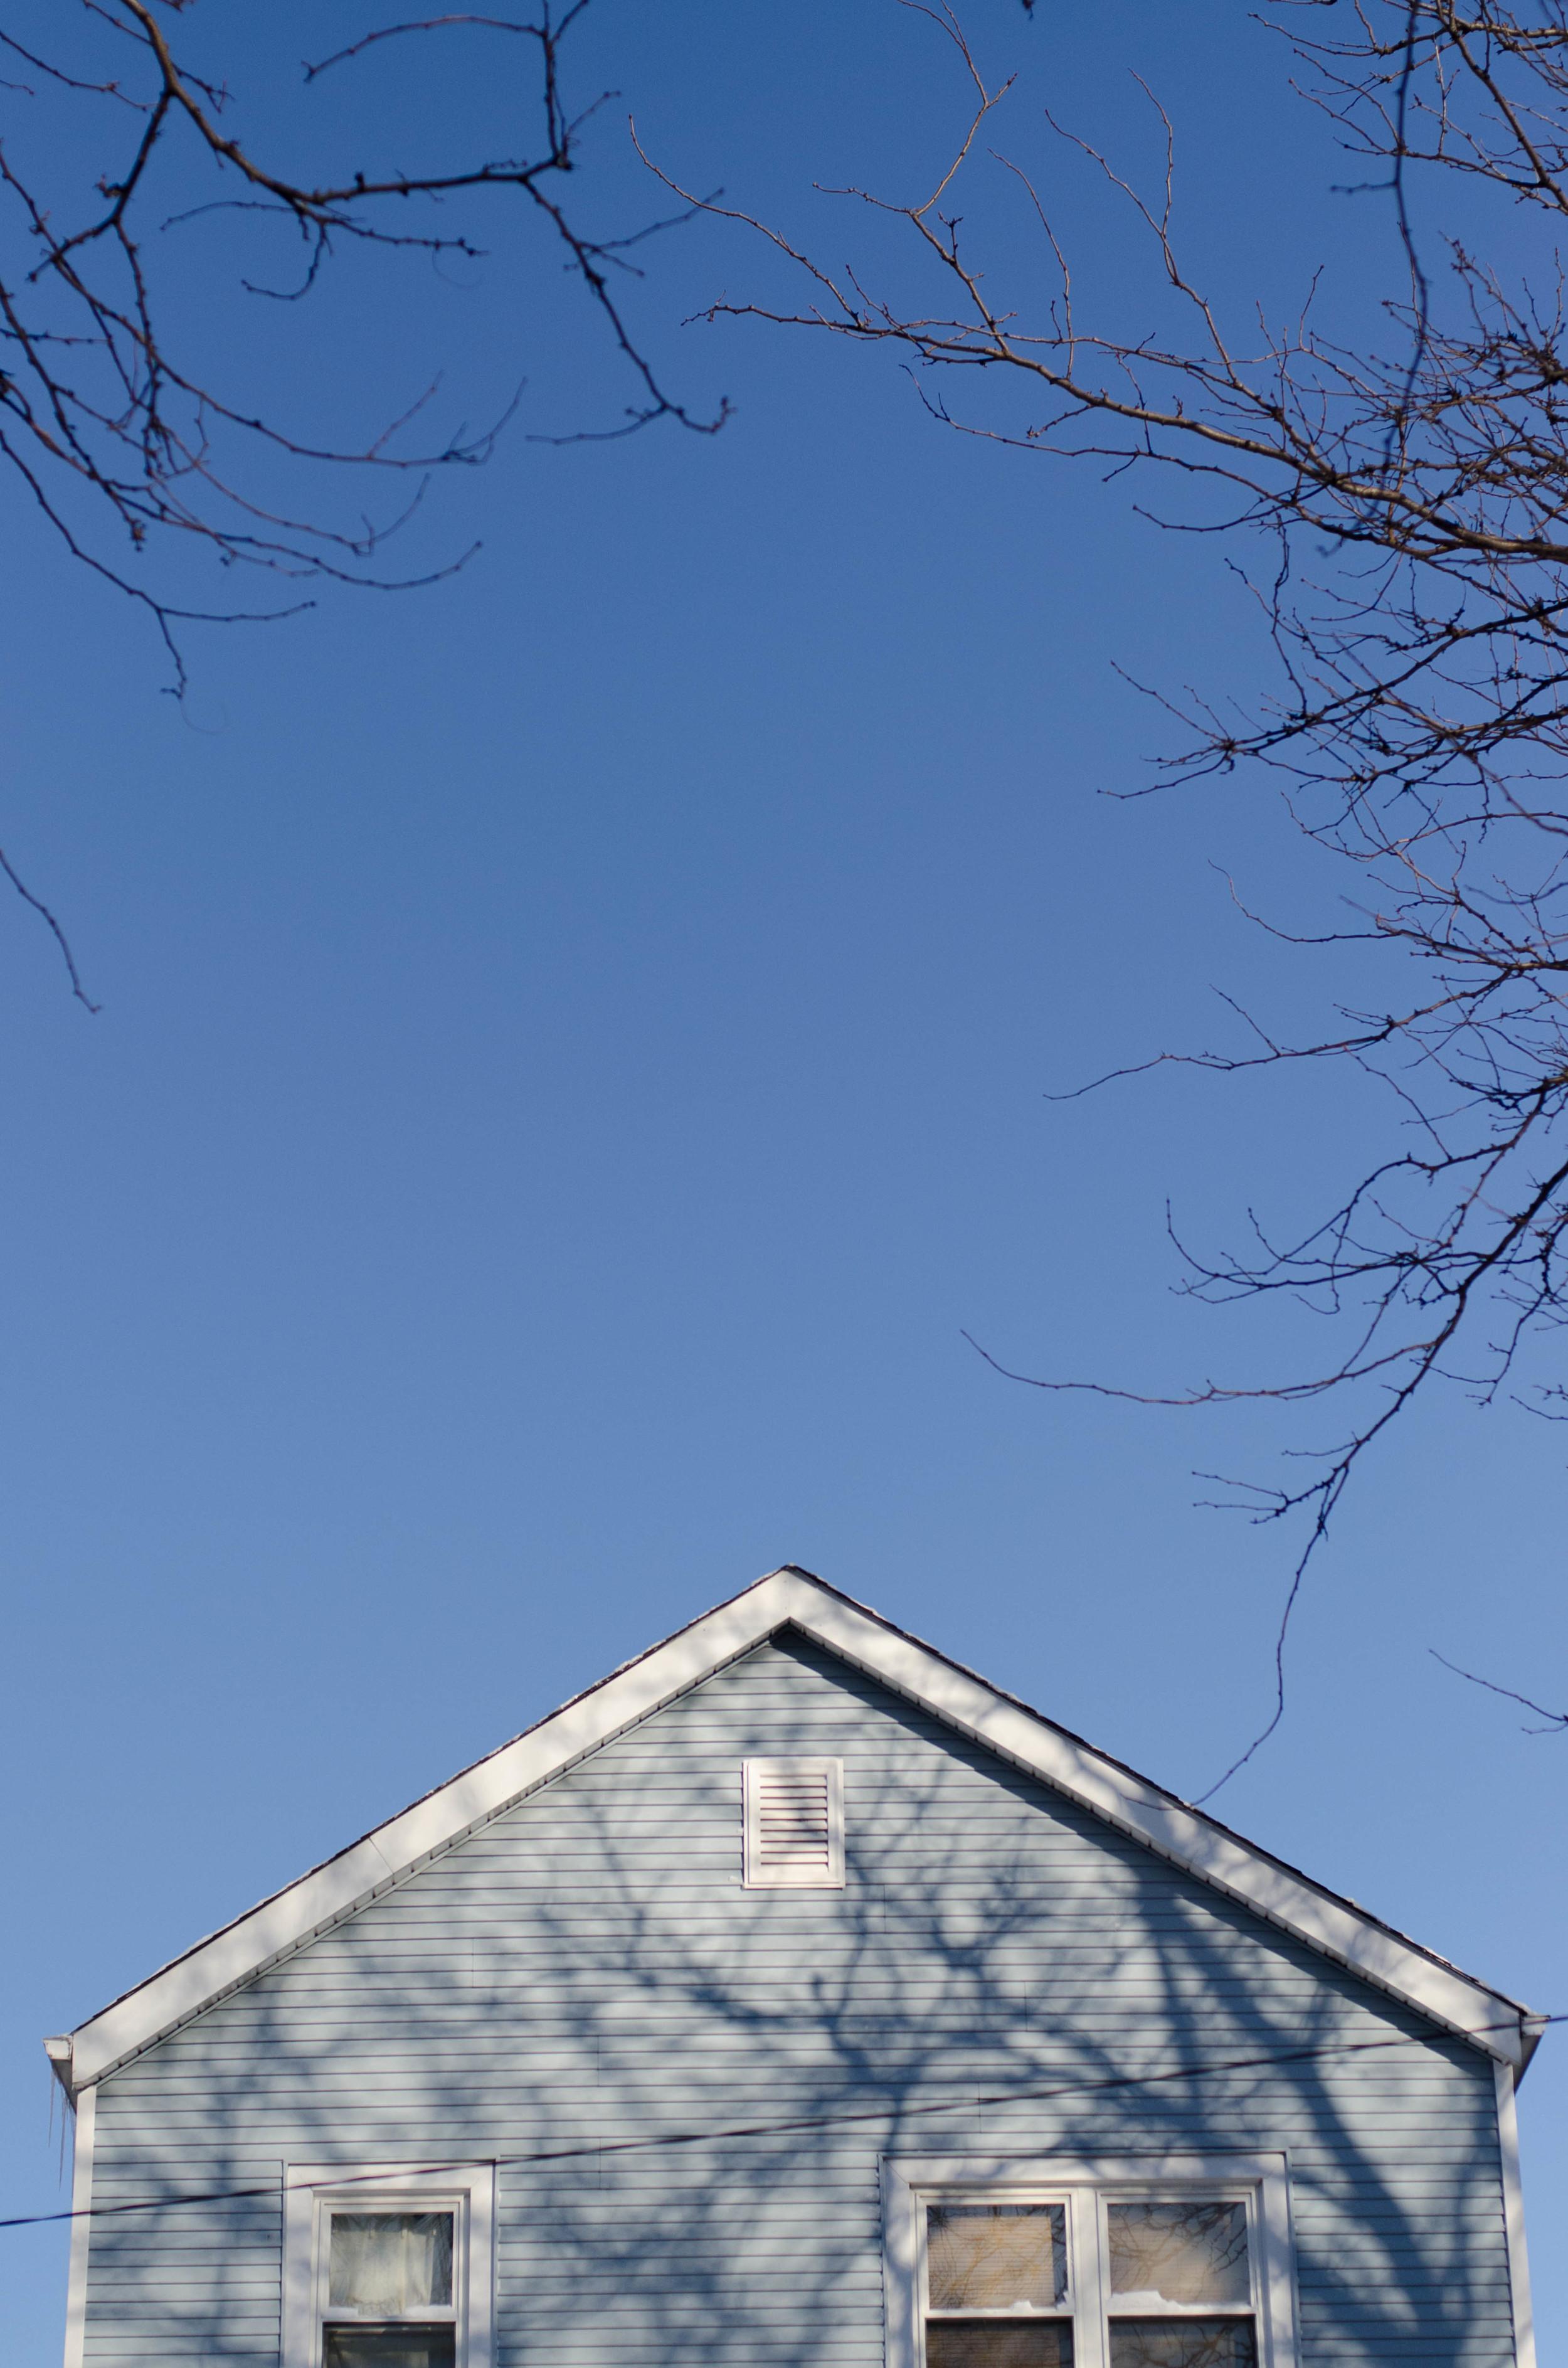 bluehouse (1 of 1).jpg